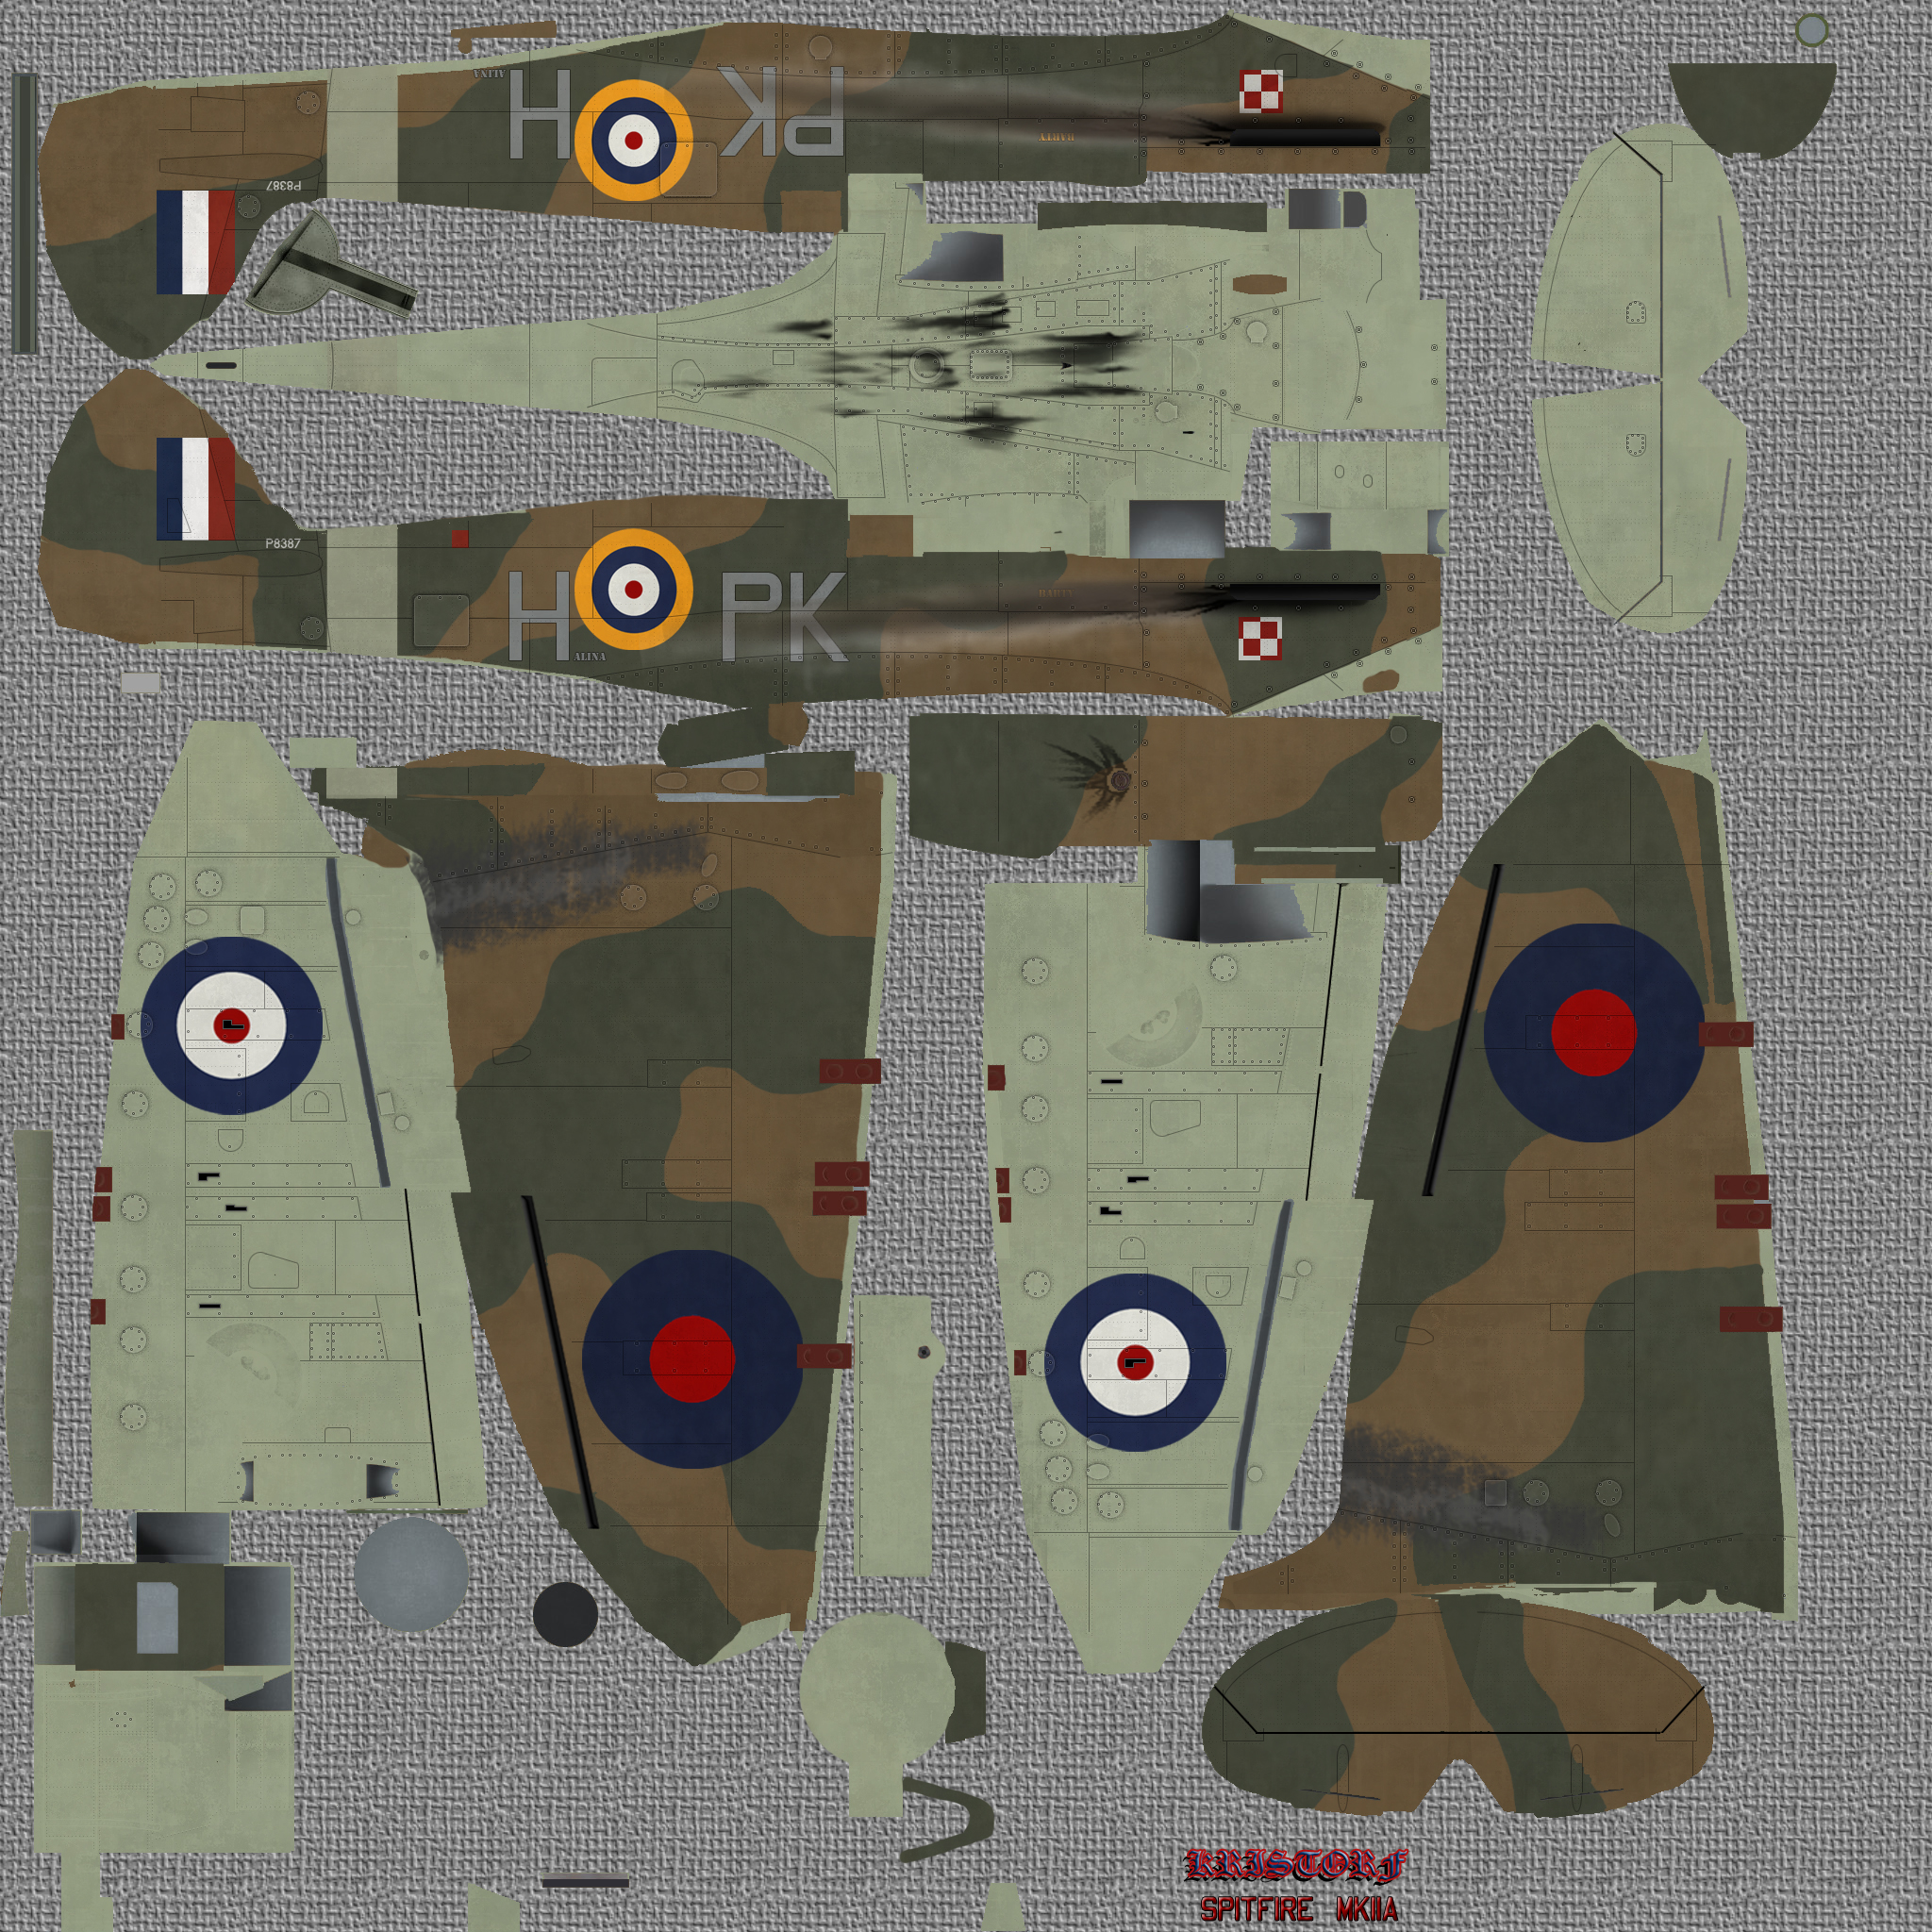 COD KF MkII RAF 315Sqn PKH P8387 Northolt England July 1941